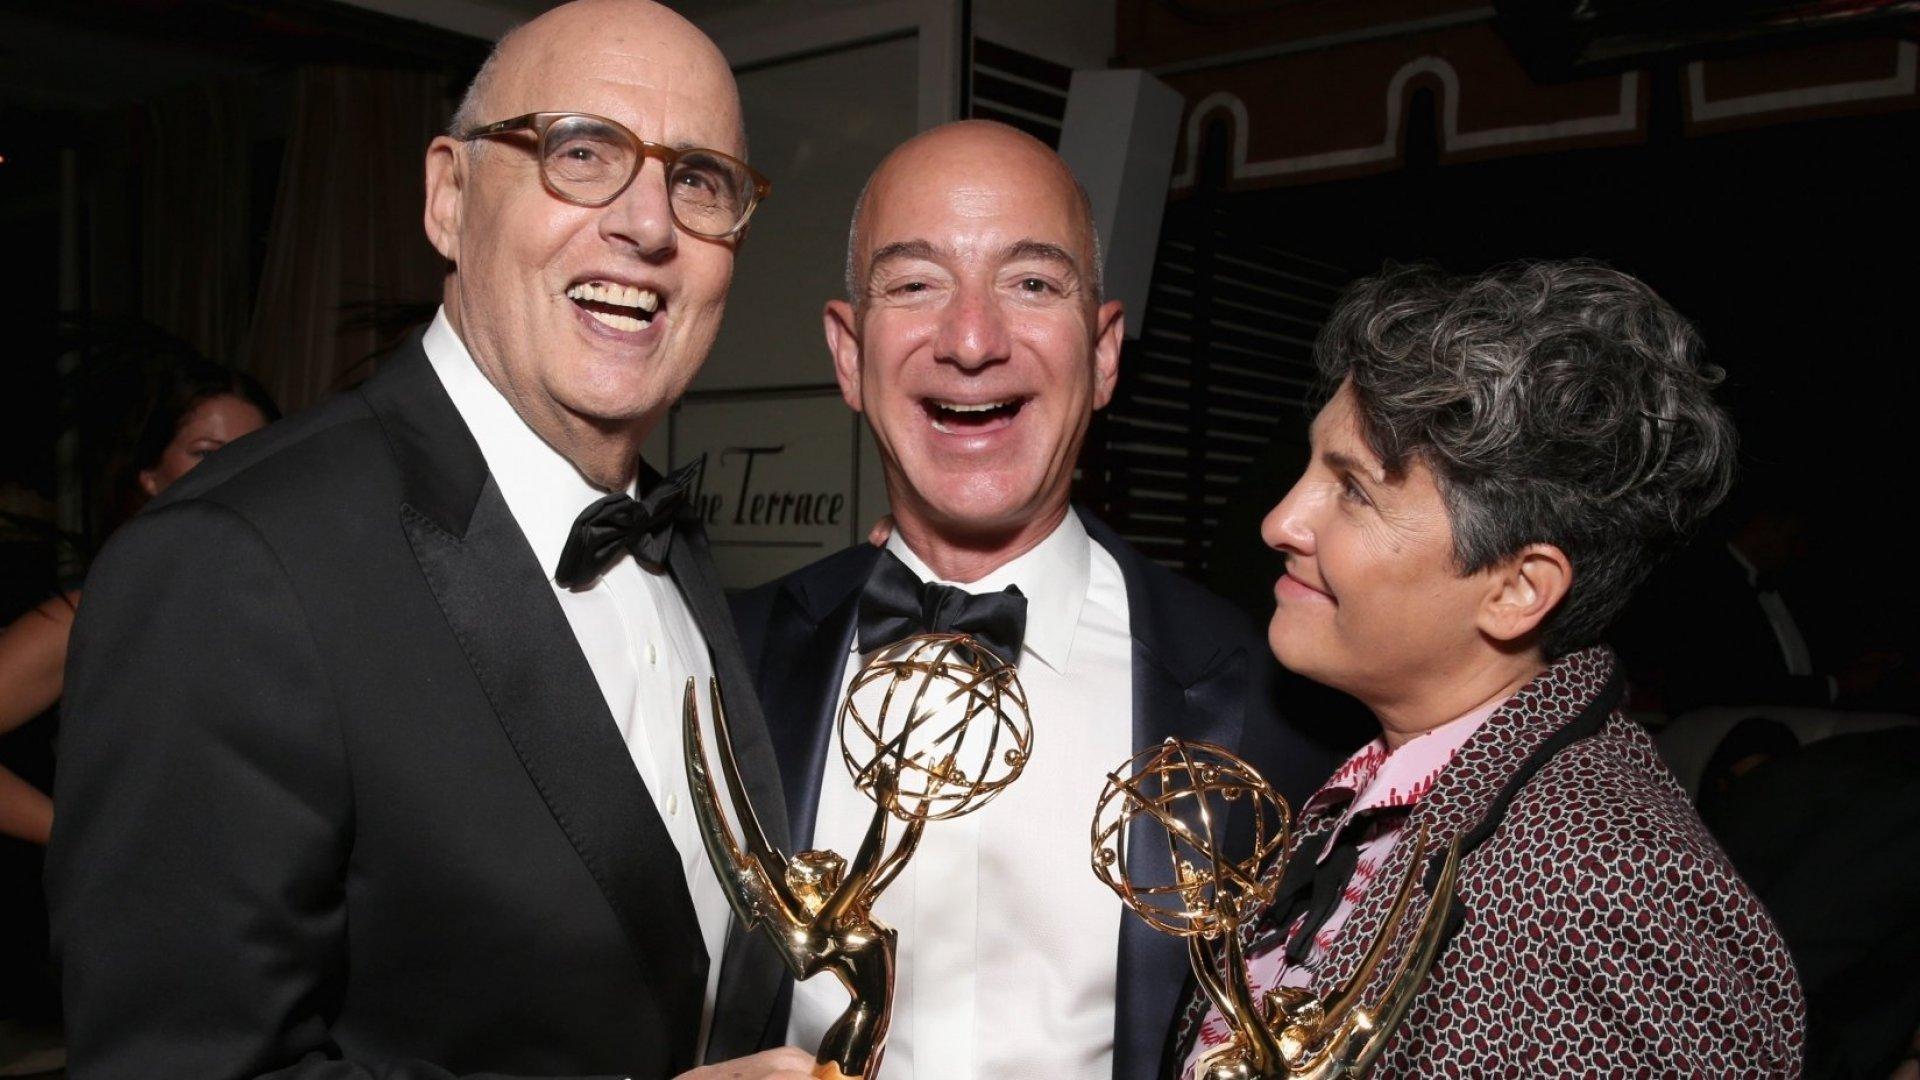 Jeff Bezos Ranks Third on the List of Global Billionaires in 2017